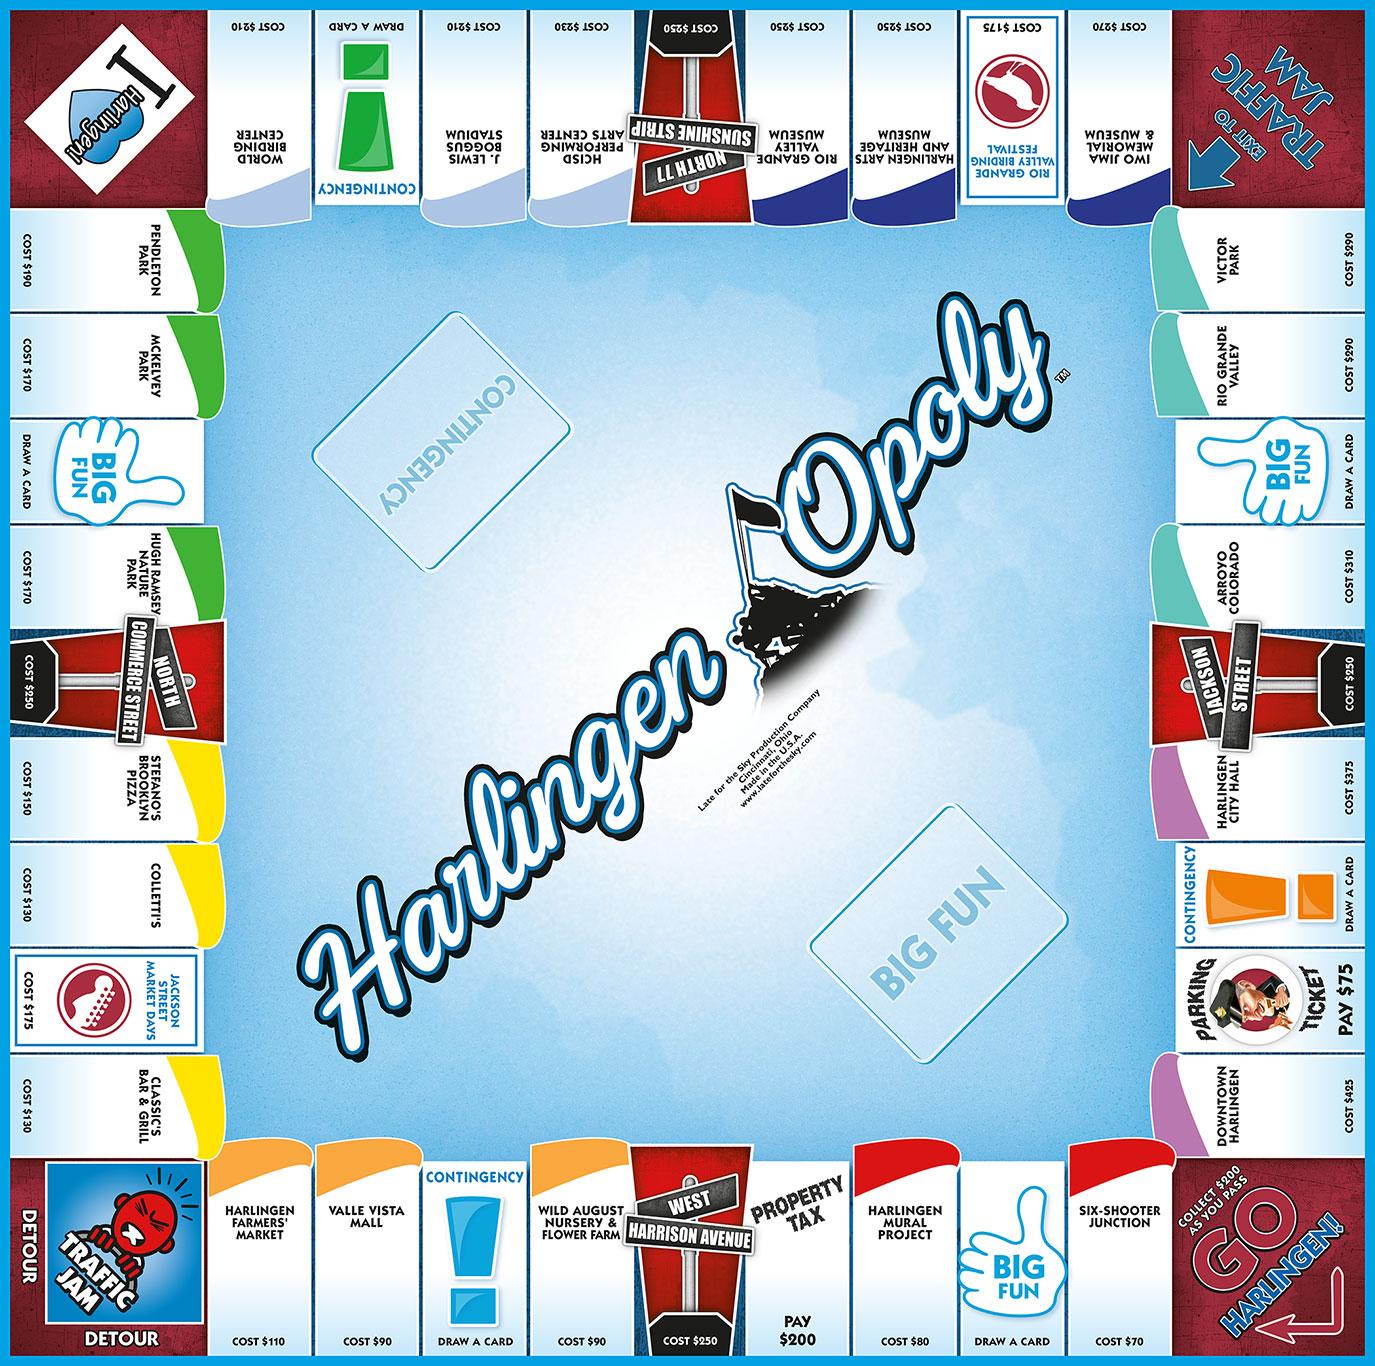 HARLINGEN-OPOLY Board Game